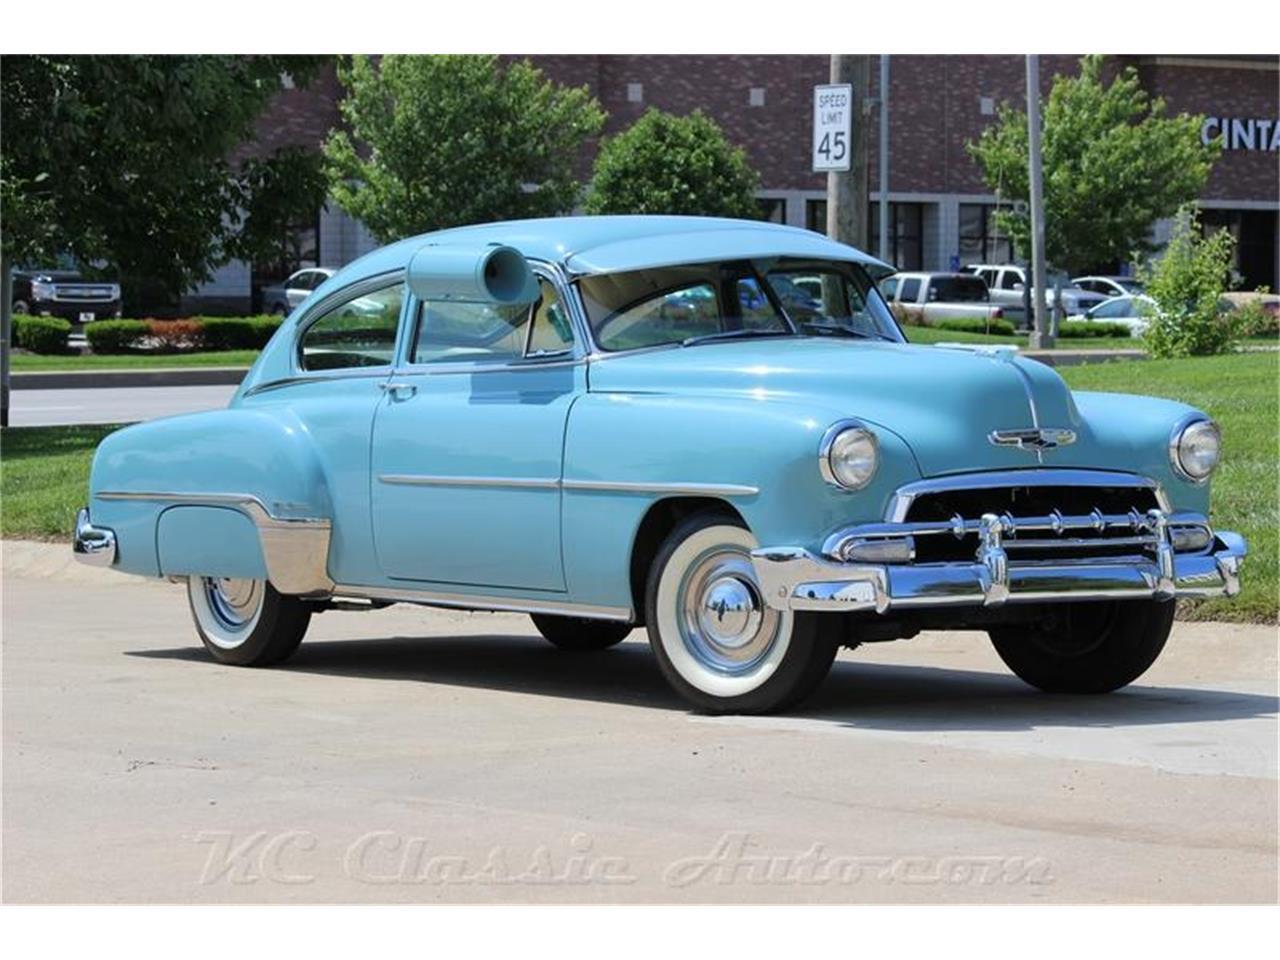 1952 Chevrolet Belaire Fleetline Deluxe Automatic, Air ...